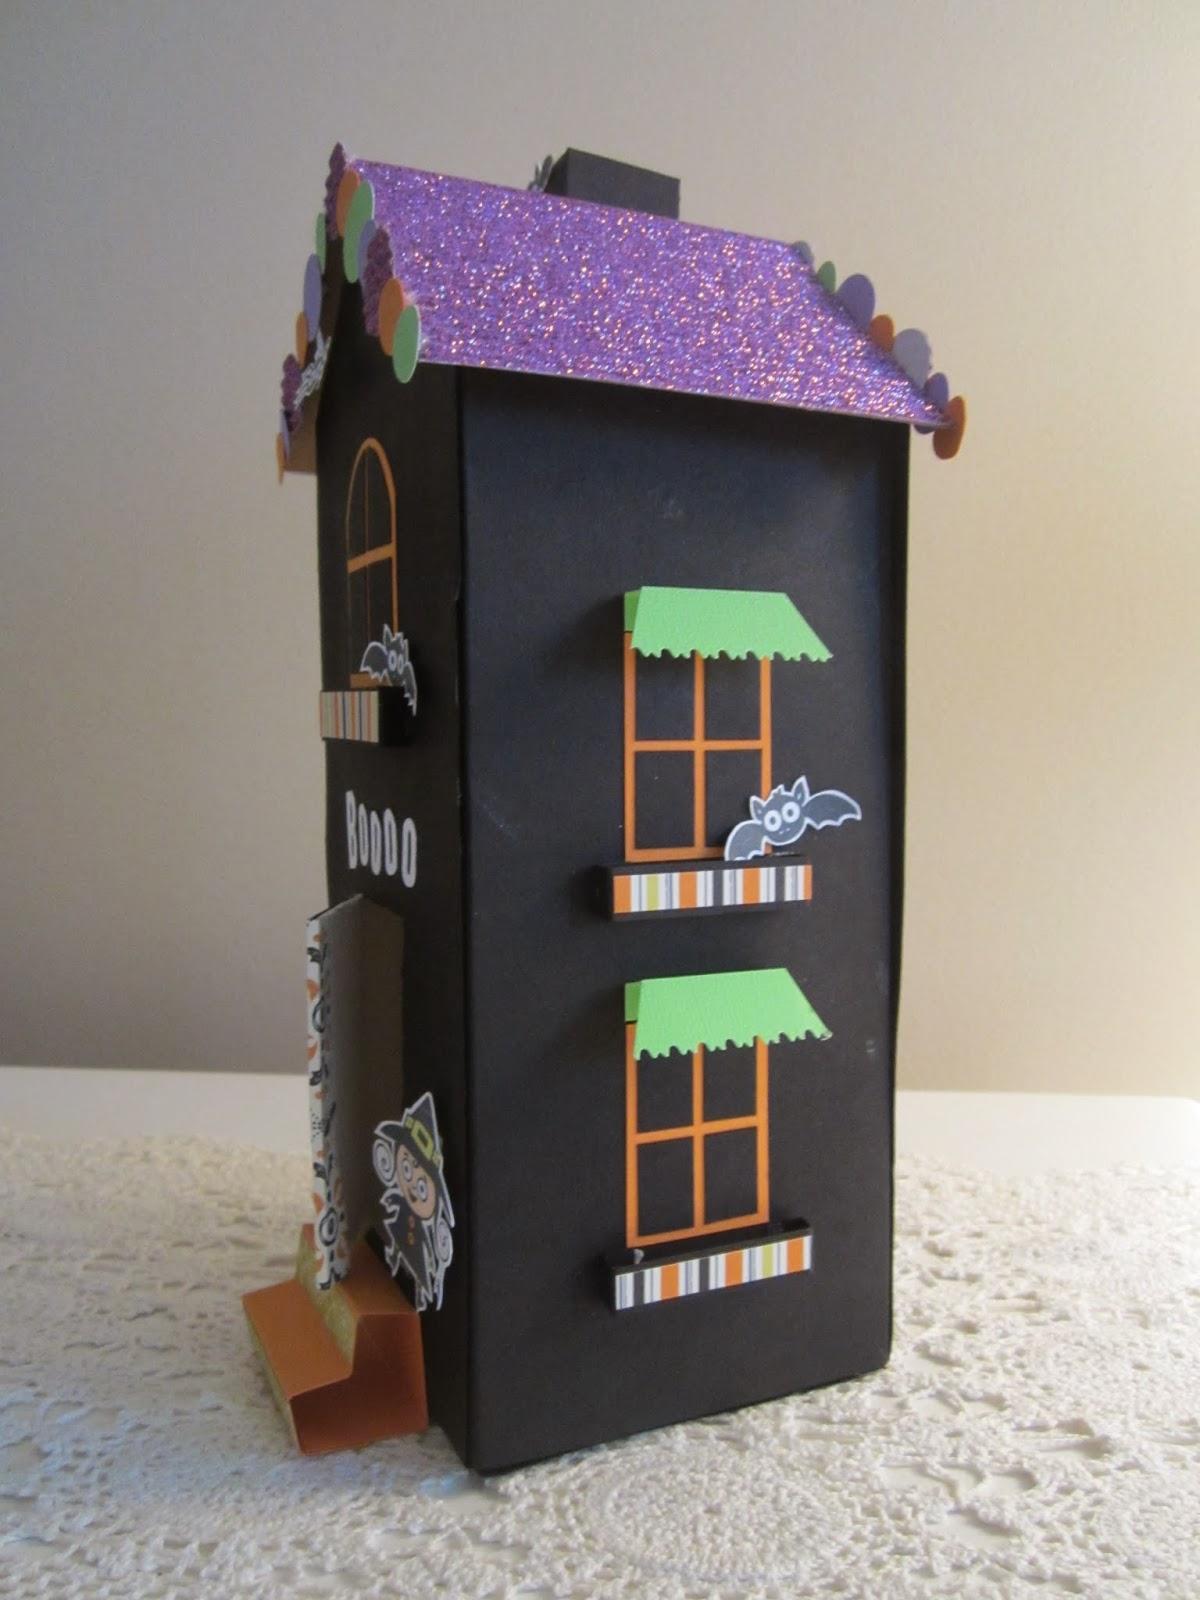 passion carton maison hant e. Black Bedroom Furniture Sets. Home Design Ideas